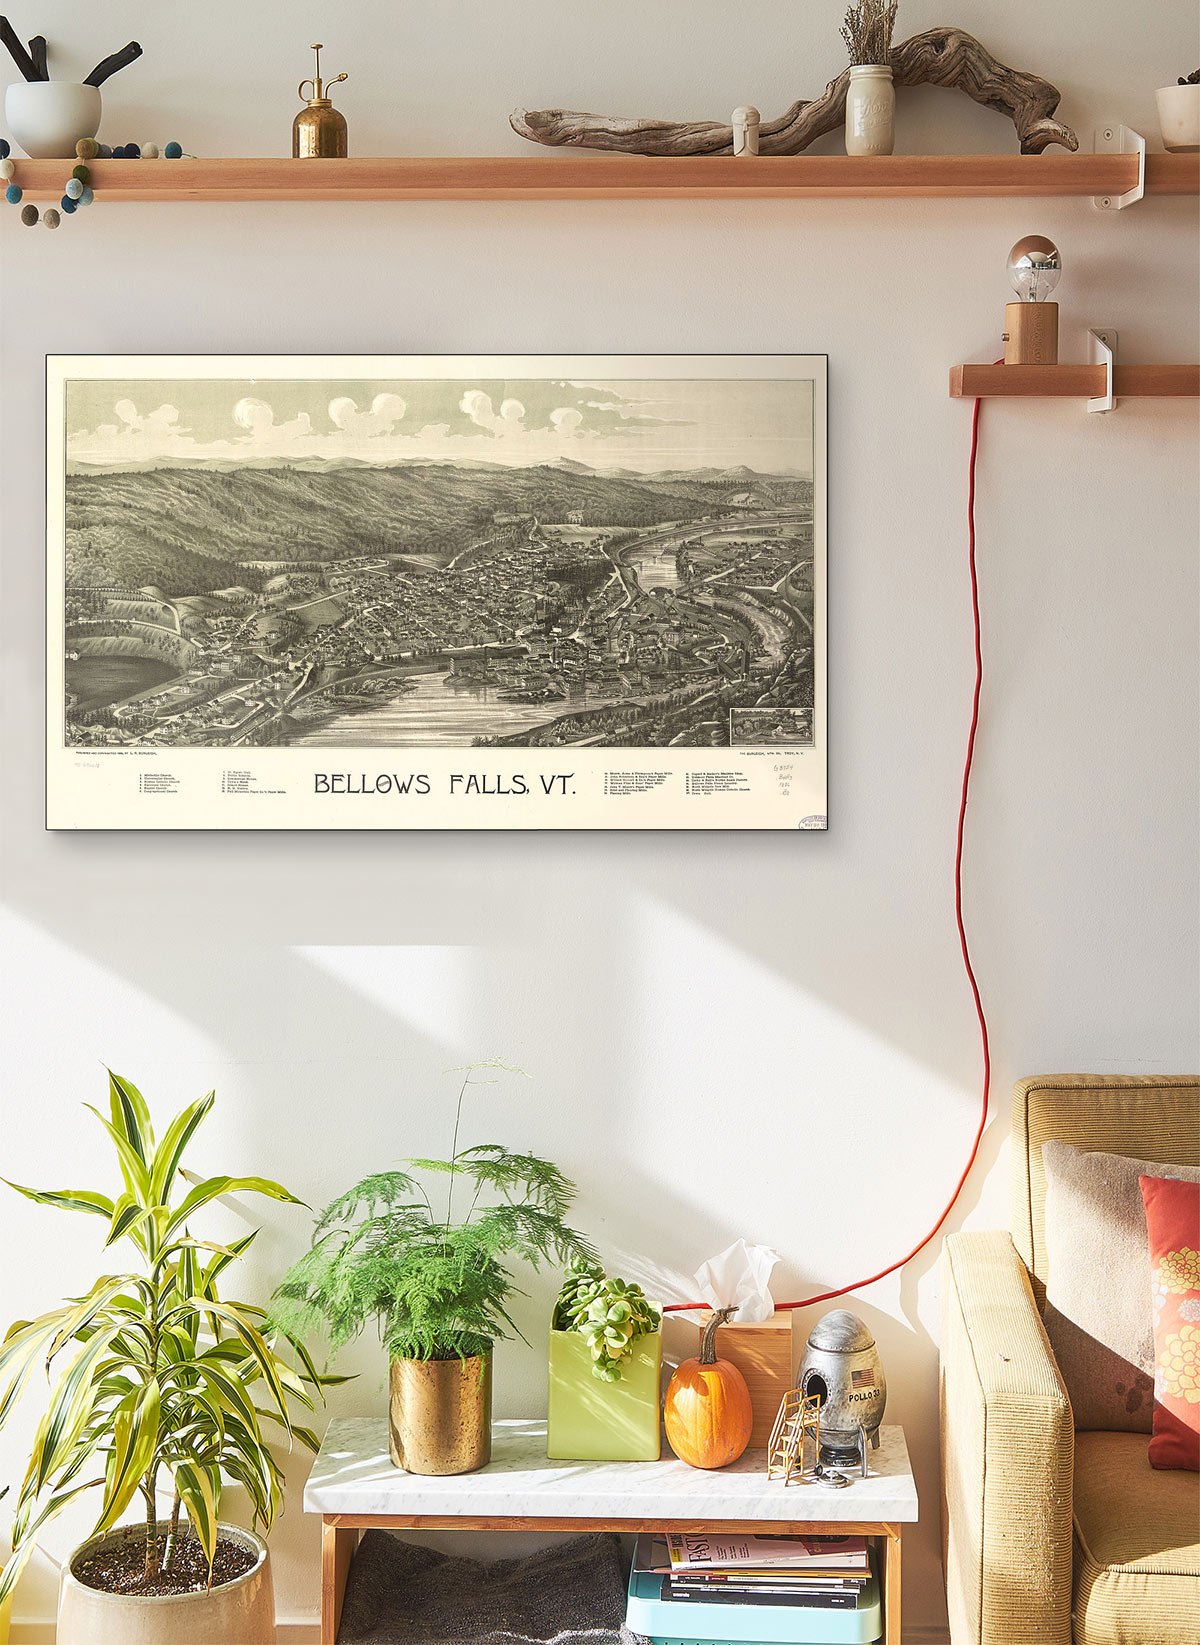 Bellows Falls Vt LARGE Vintage Map